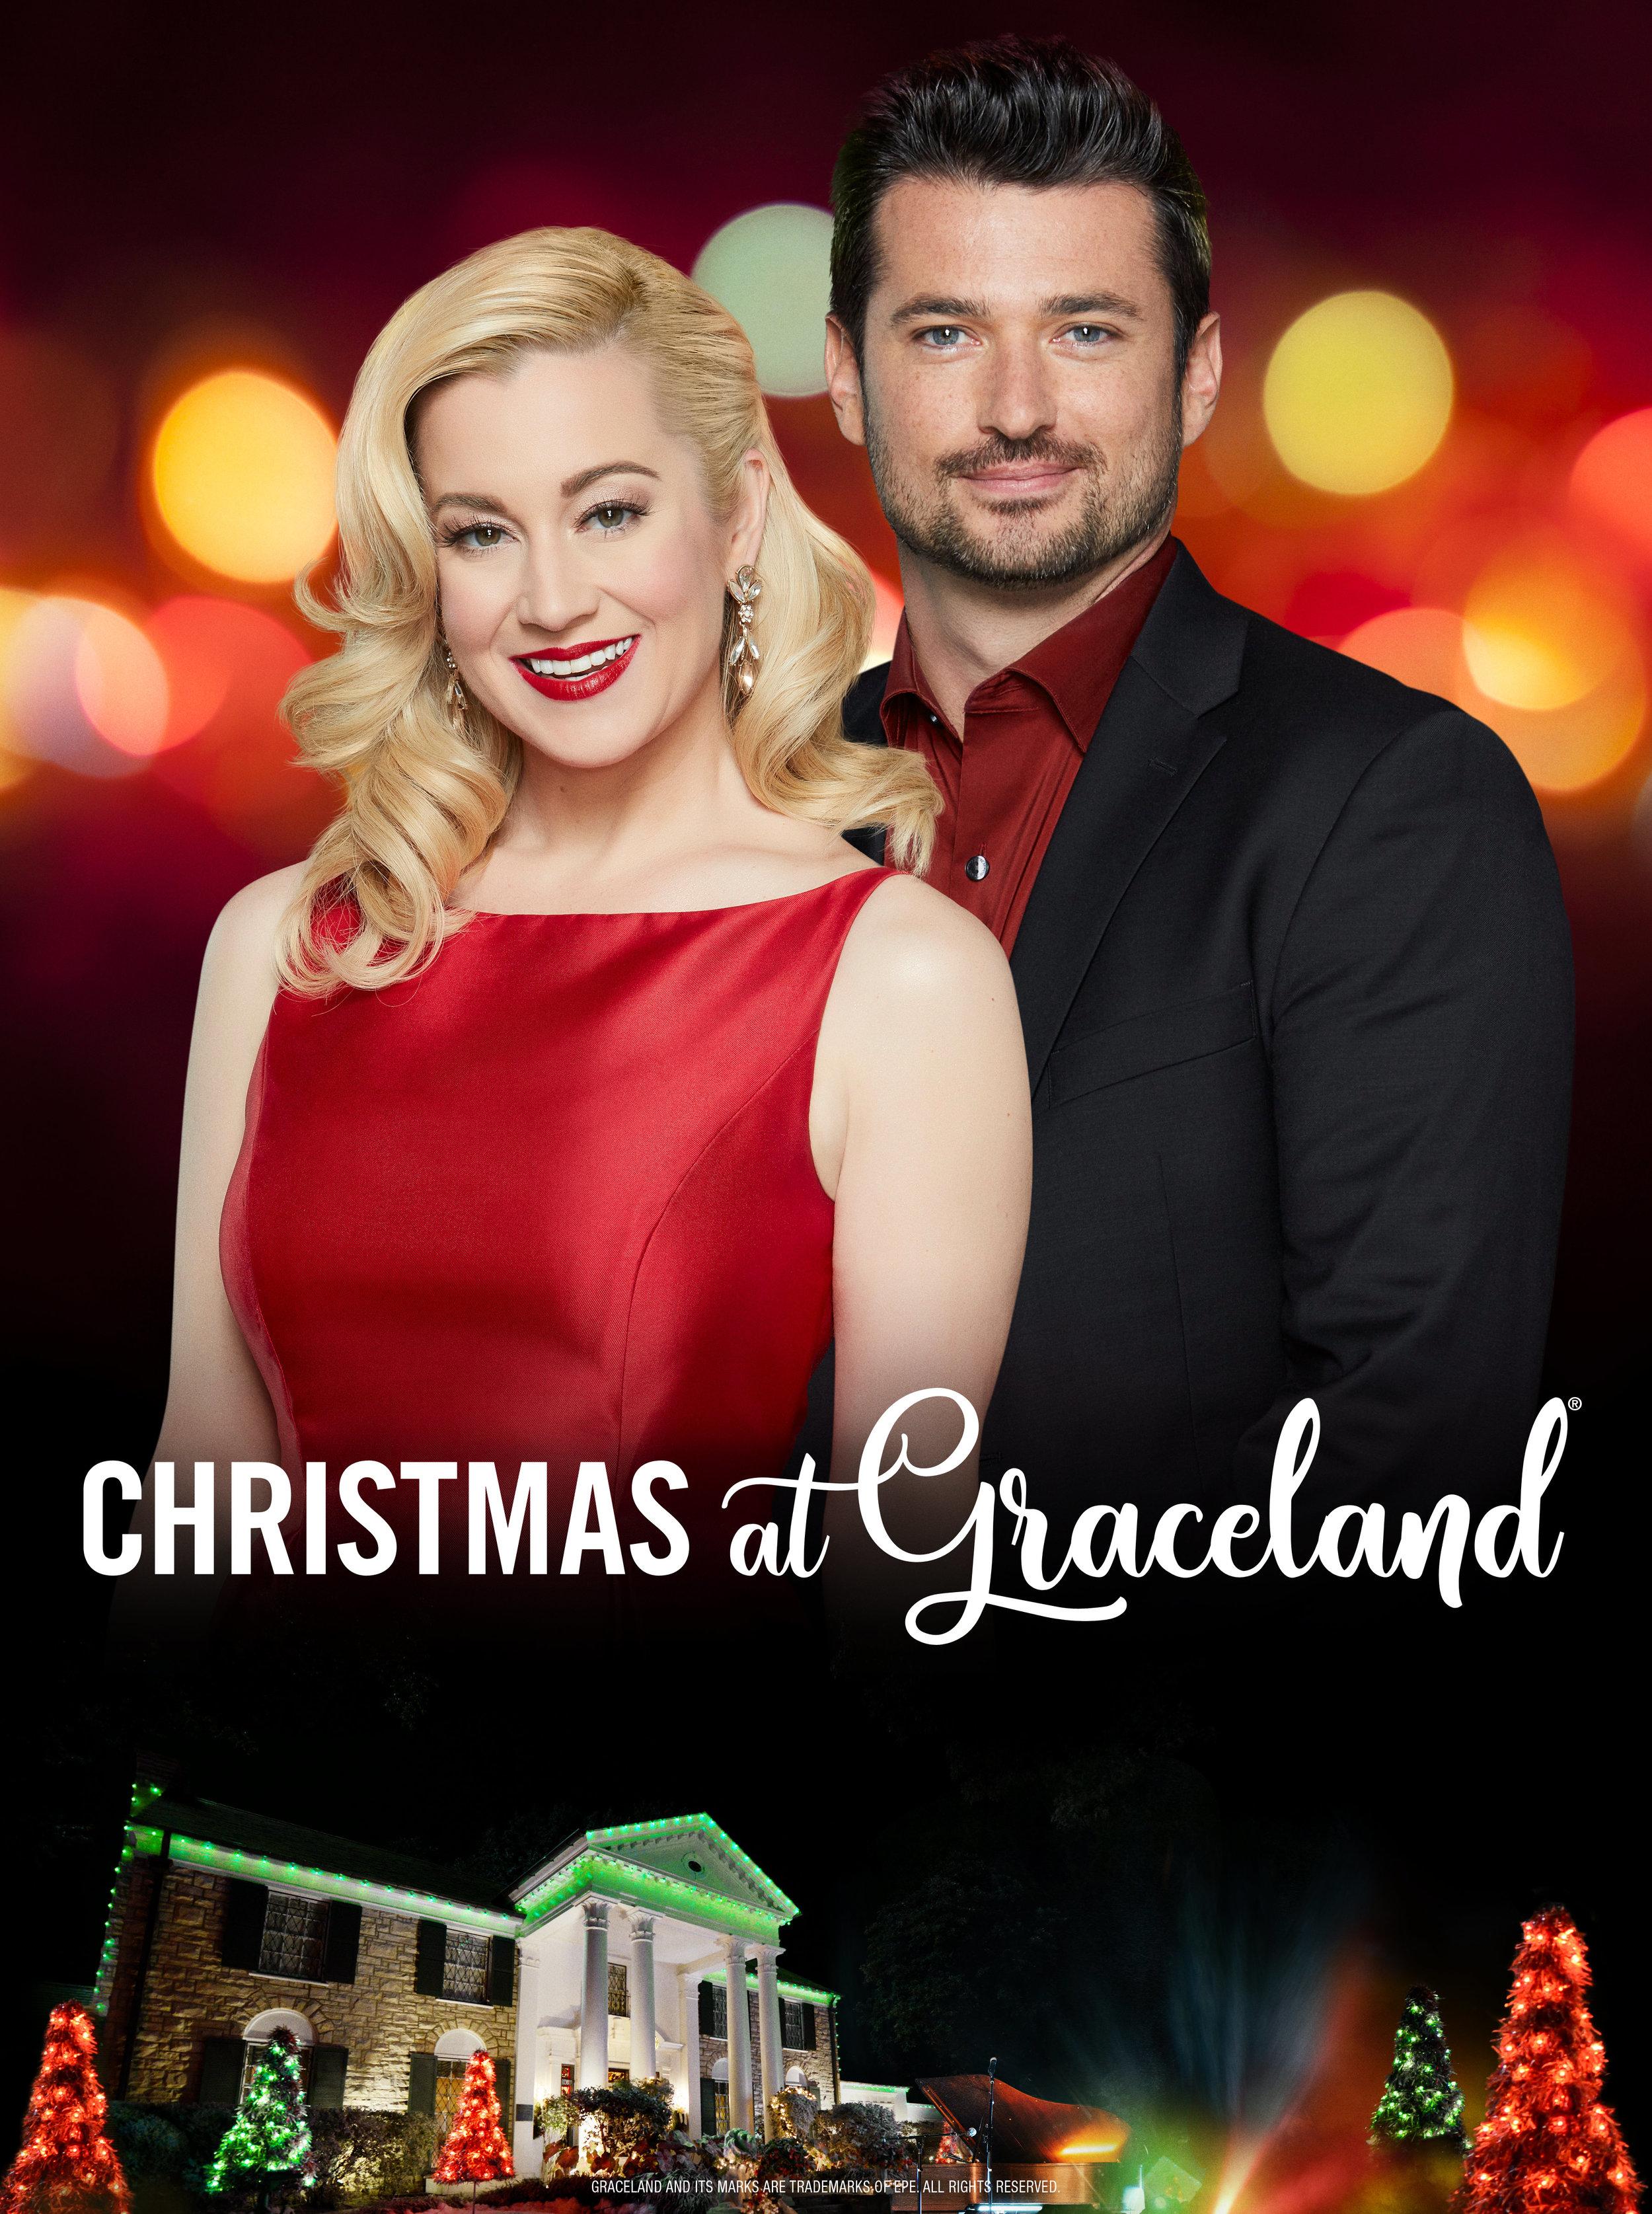 ChristmasAtGraceland_FKA-2.jpg